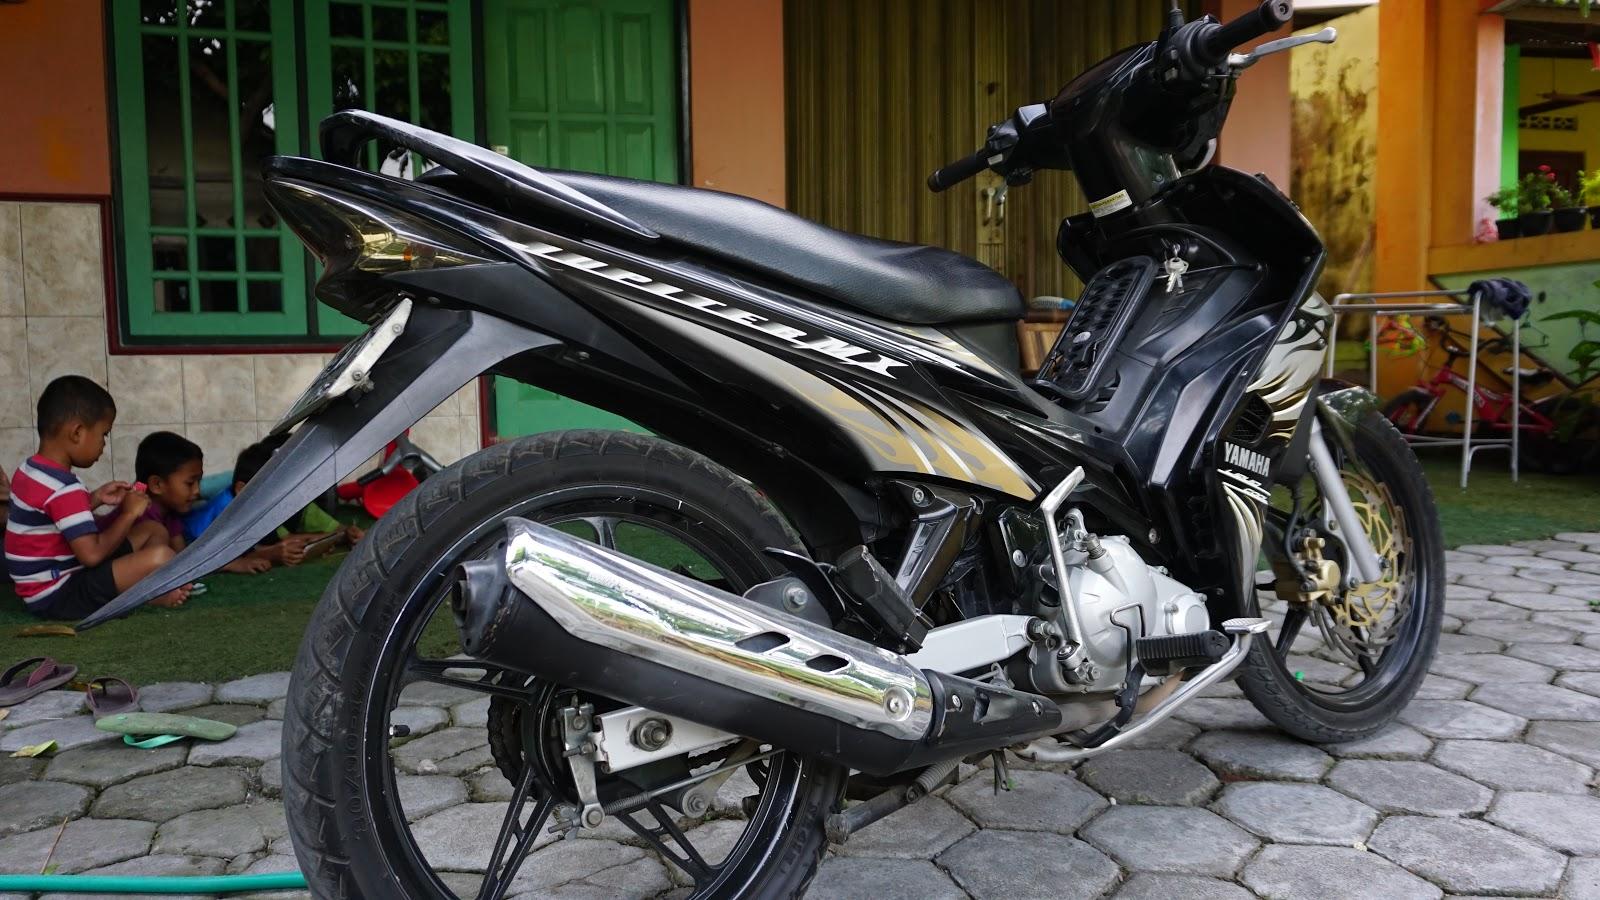 Motor yamaha jupiter mx 135 cc tahun 2020 plat AB Bantul